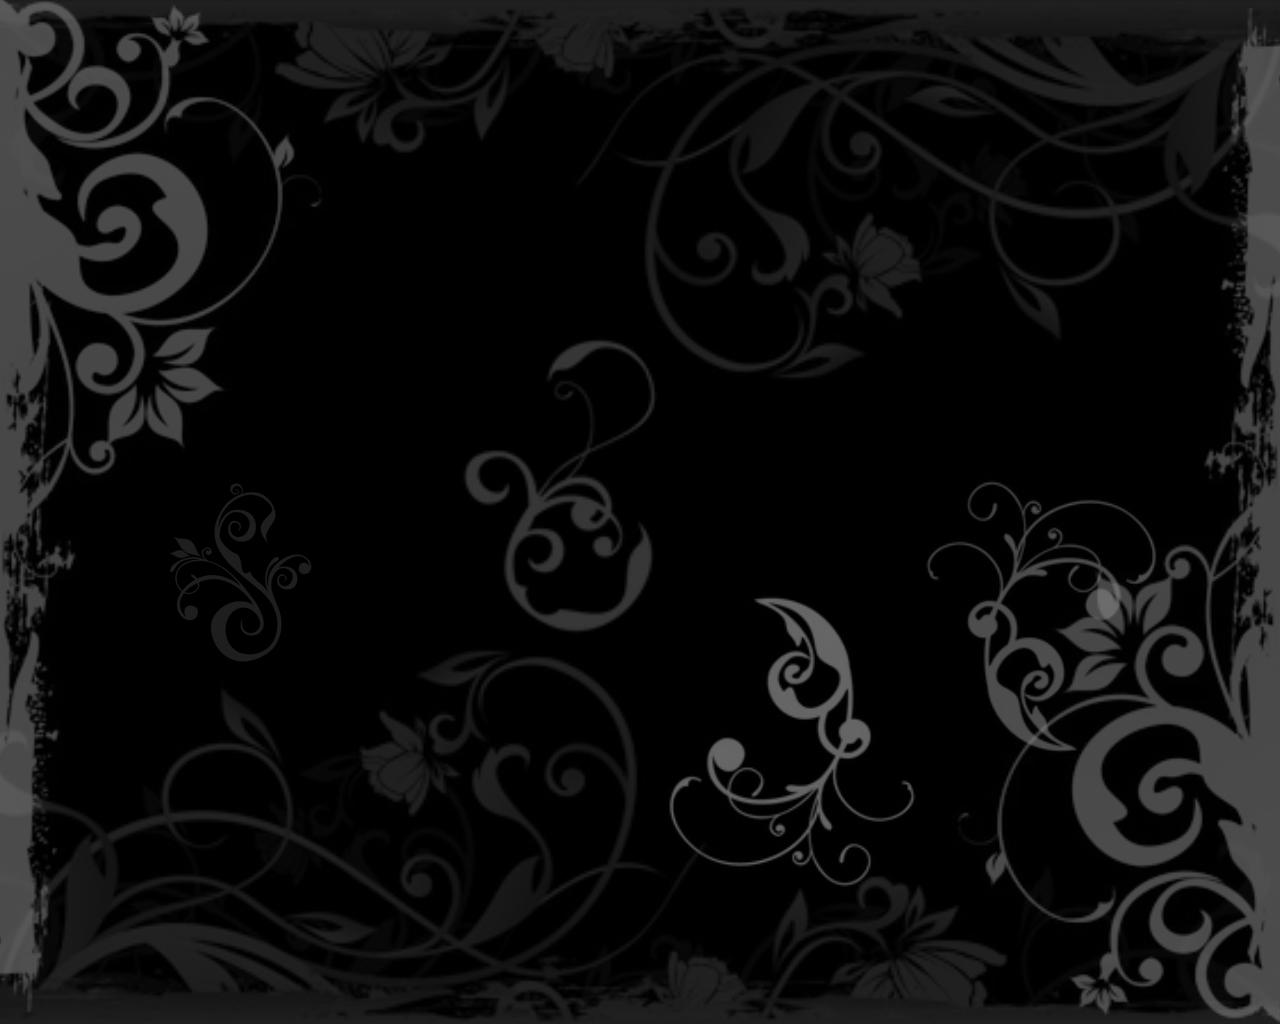 http://2.bp.blogspot.com/-ZPnT2iB12OM/UJl7j28kfvI/AAAAAAAAAV0/BqtnRKNrsSQ/s1600/Wallpaper_black_by_Phatestroke.jpg